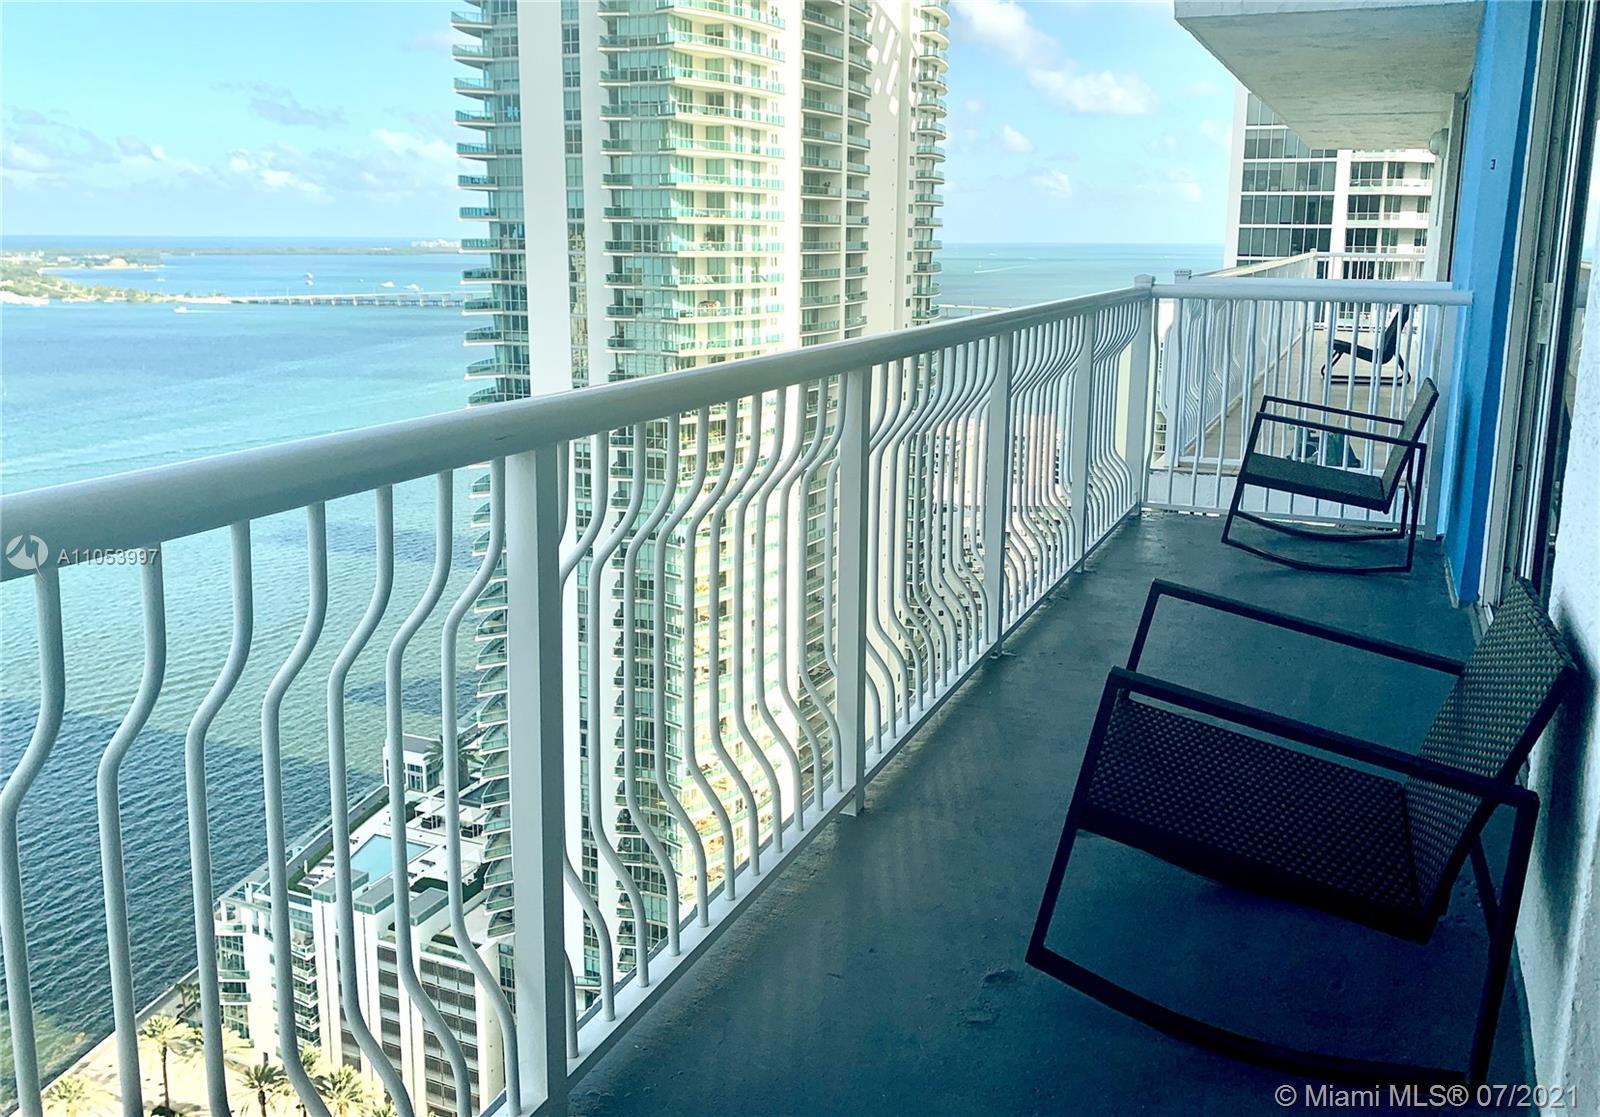 Club at Brickell #3702 - 1200 Brickell Bay Dr #3702, Miami, FL 33131